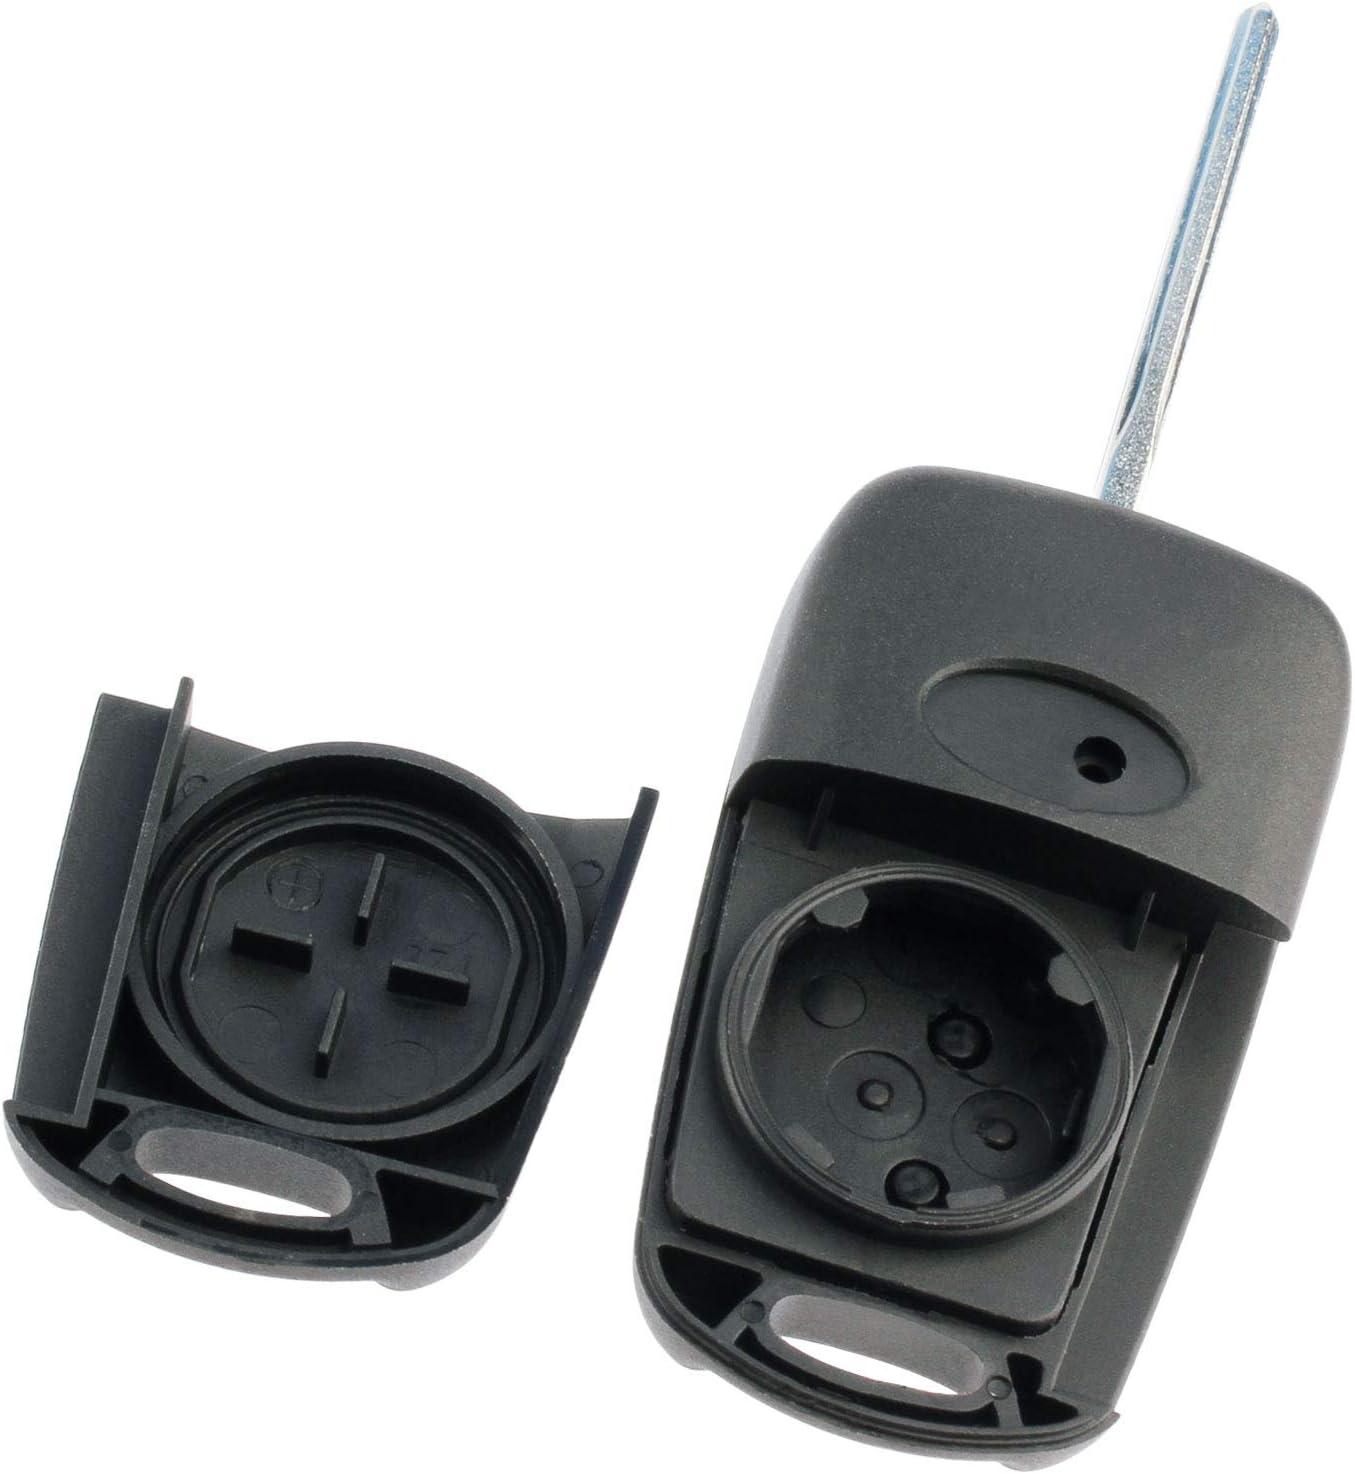 fits 2012-2014 Kia Rio 2010-2013 Kia Soul Flip Key Fob Remote Case Shell NYOSEKSAM11ATX